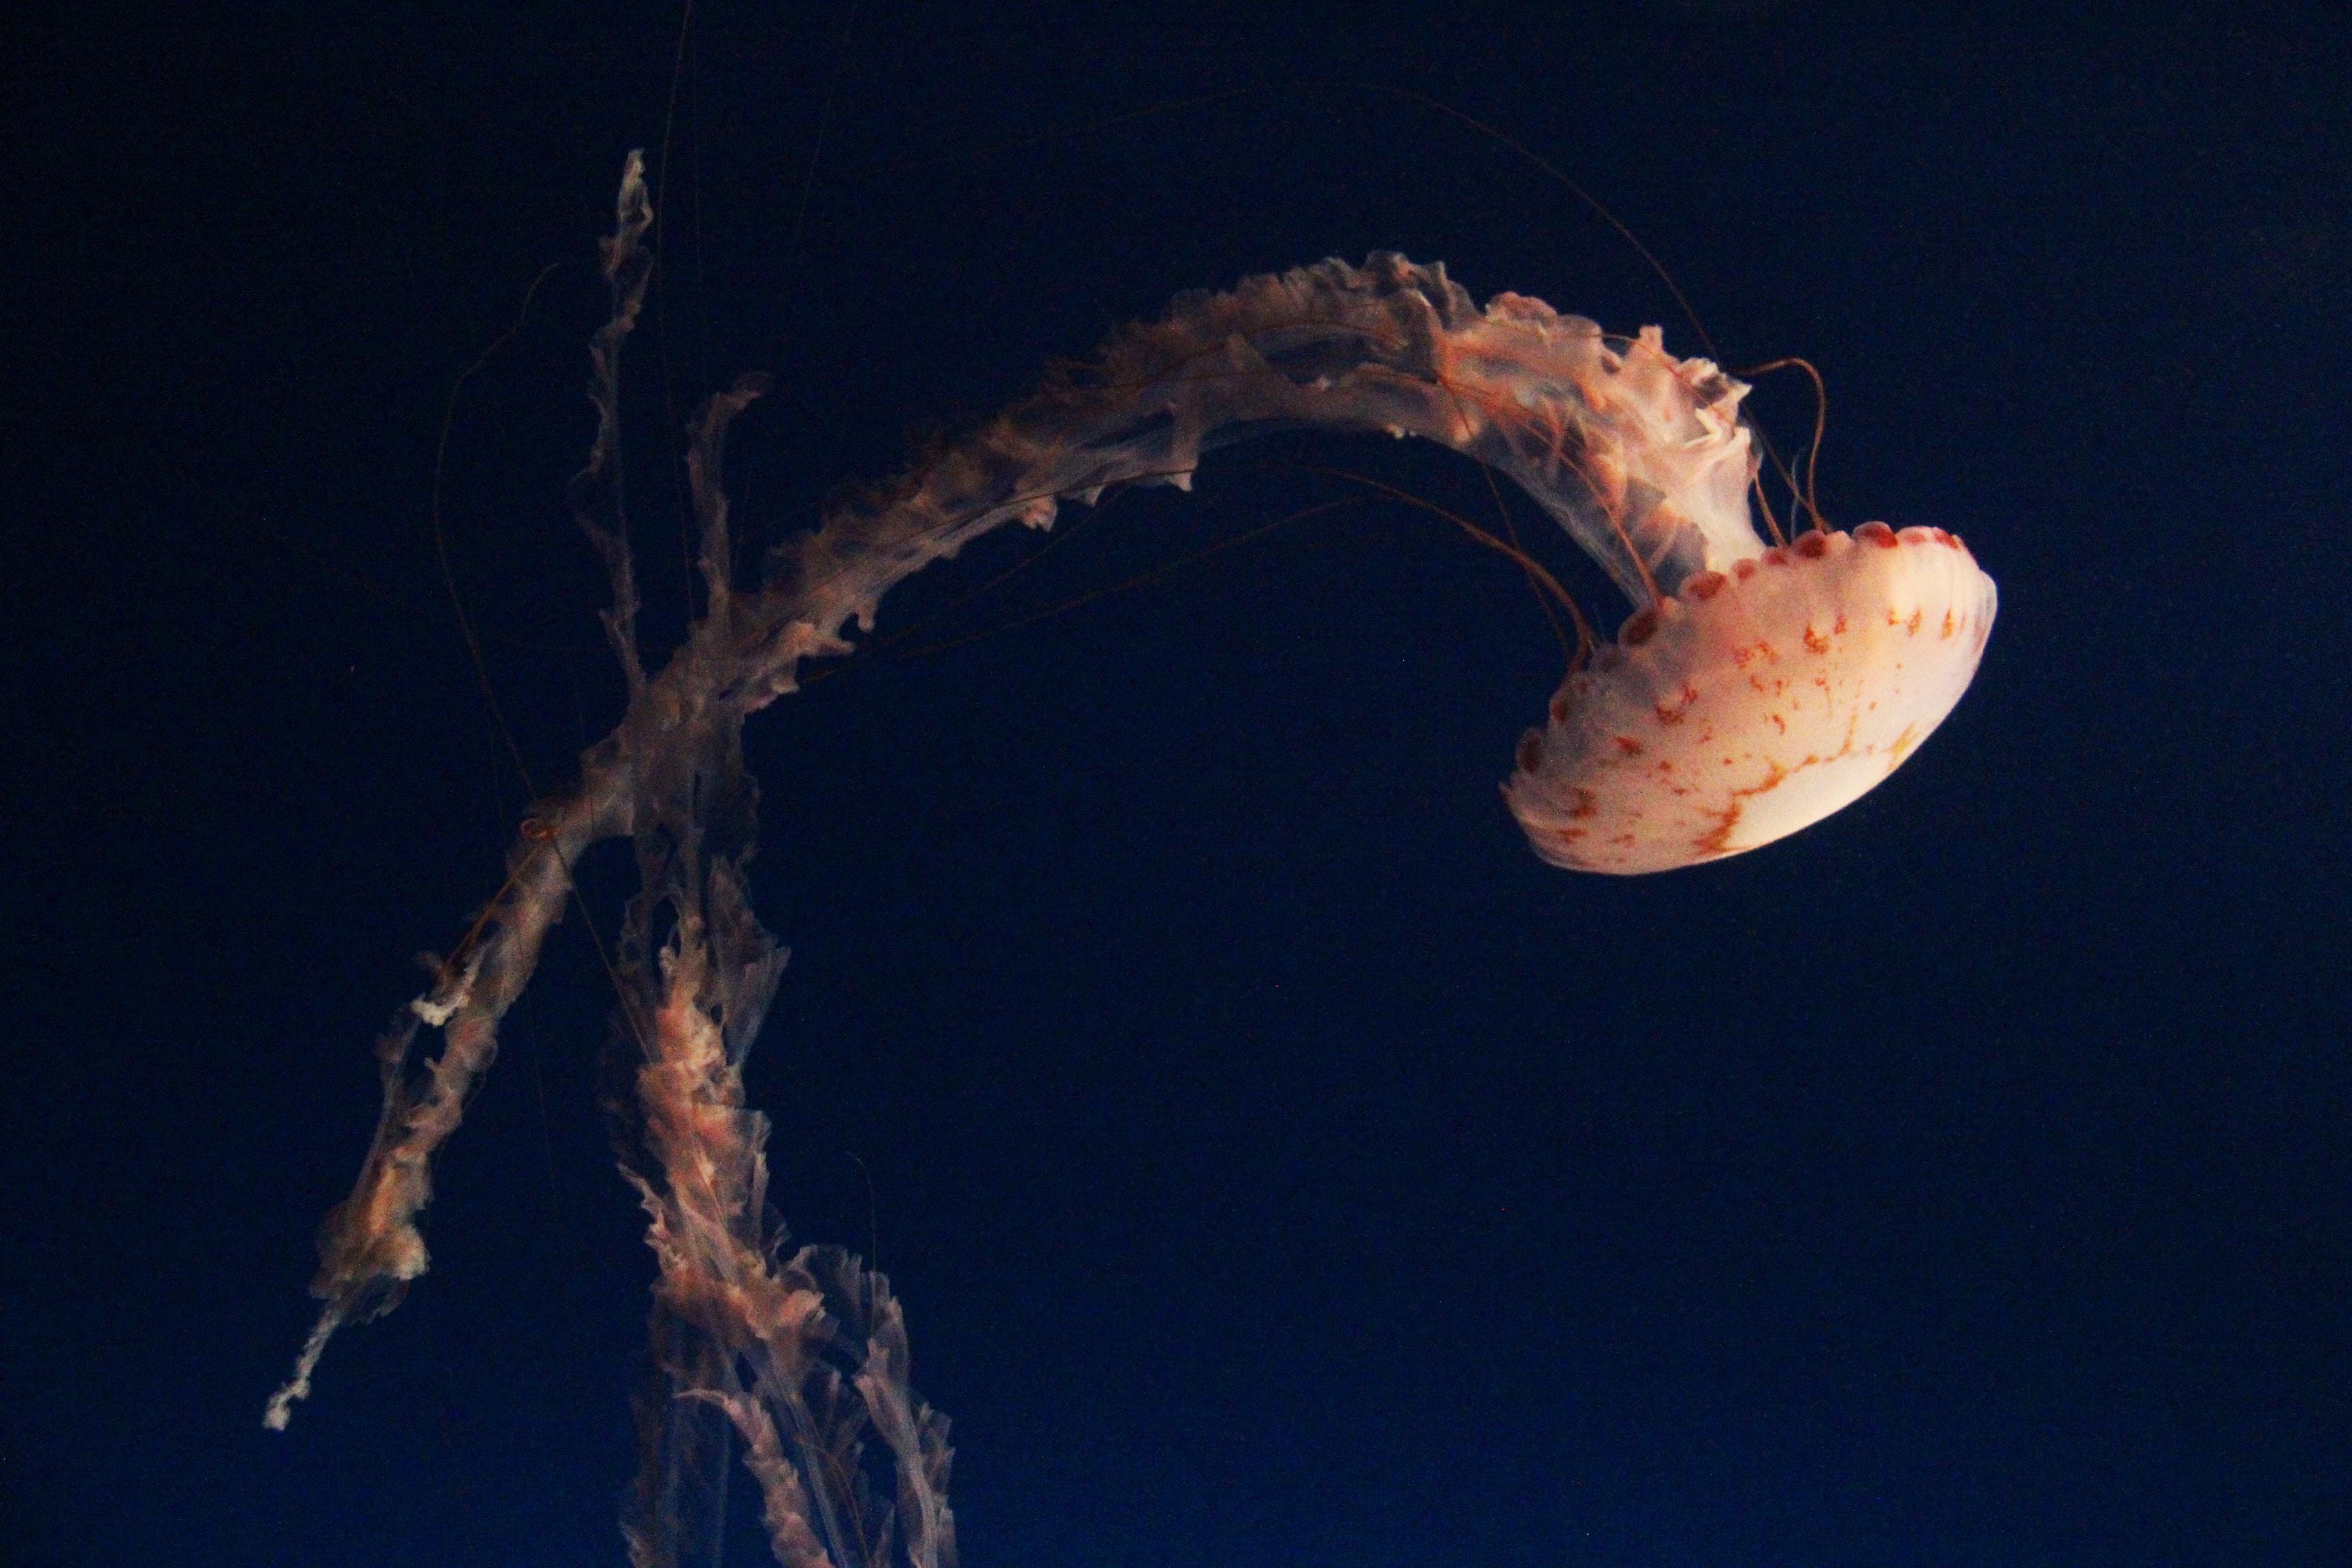 jellyfish in black background